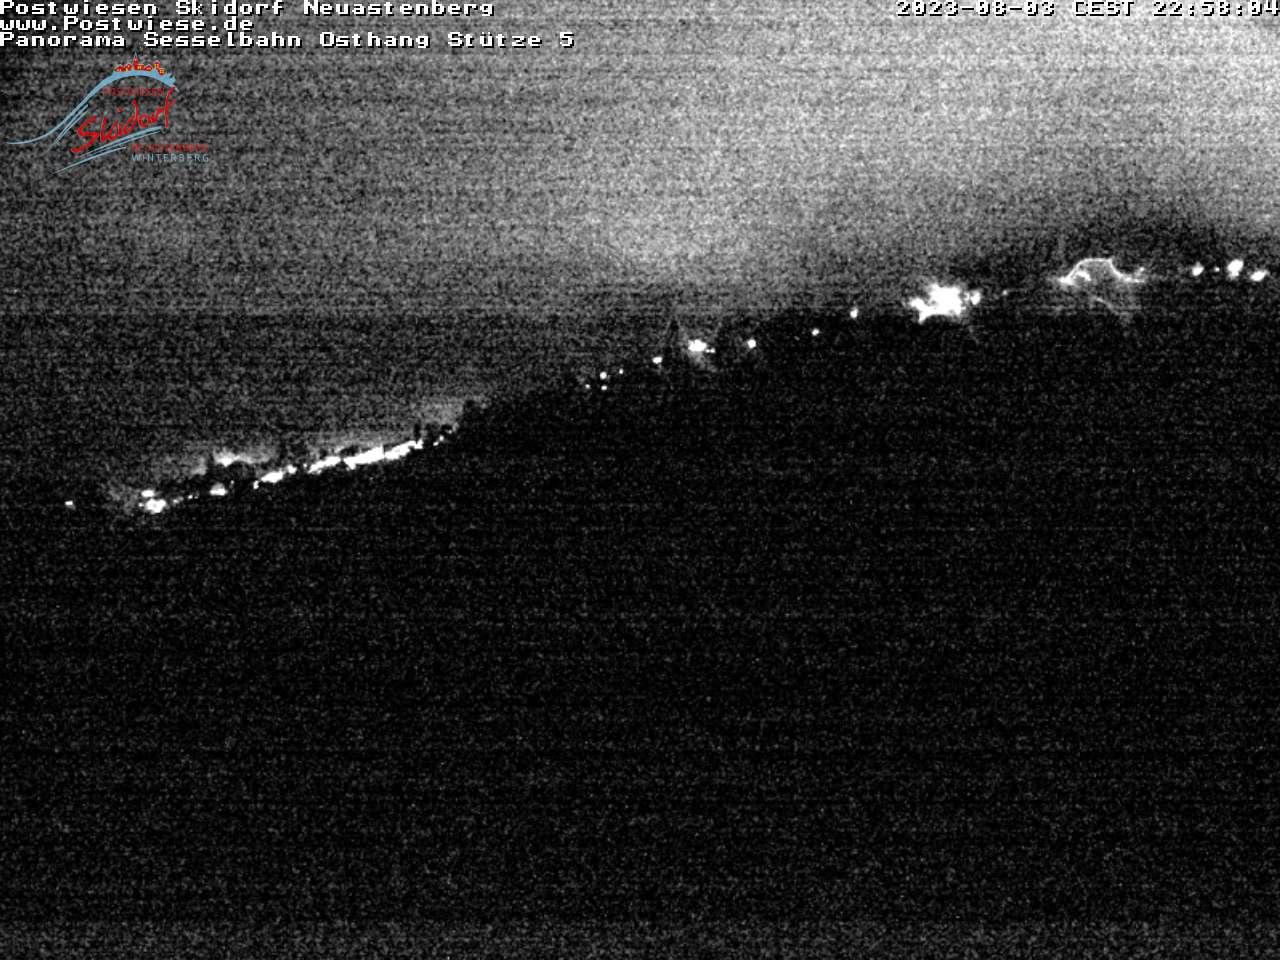 Webcam Skidorf Neuastenberg - Postwiese - Sesselbahn Osthang